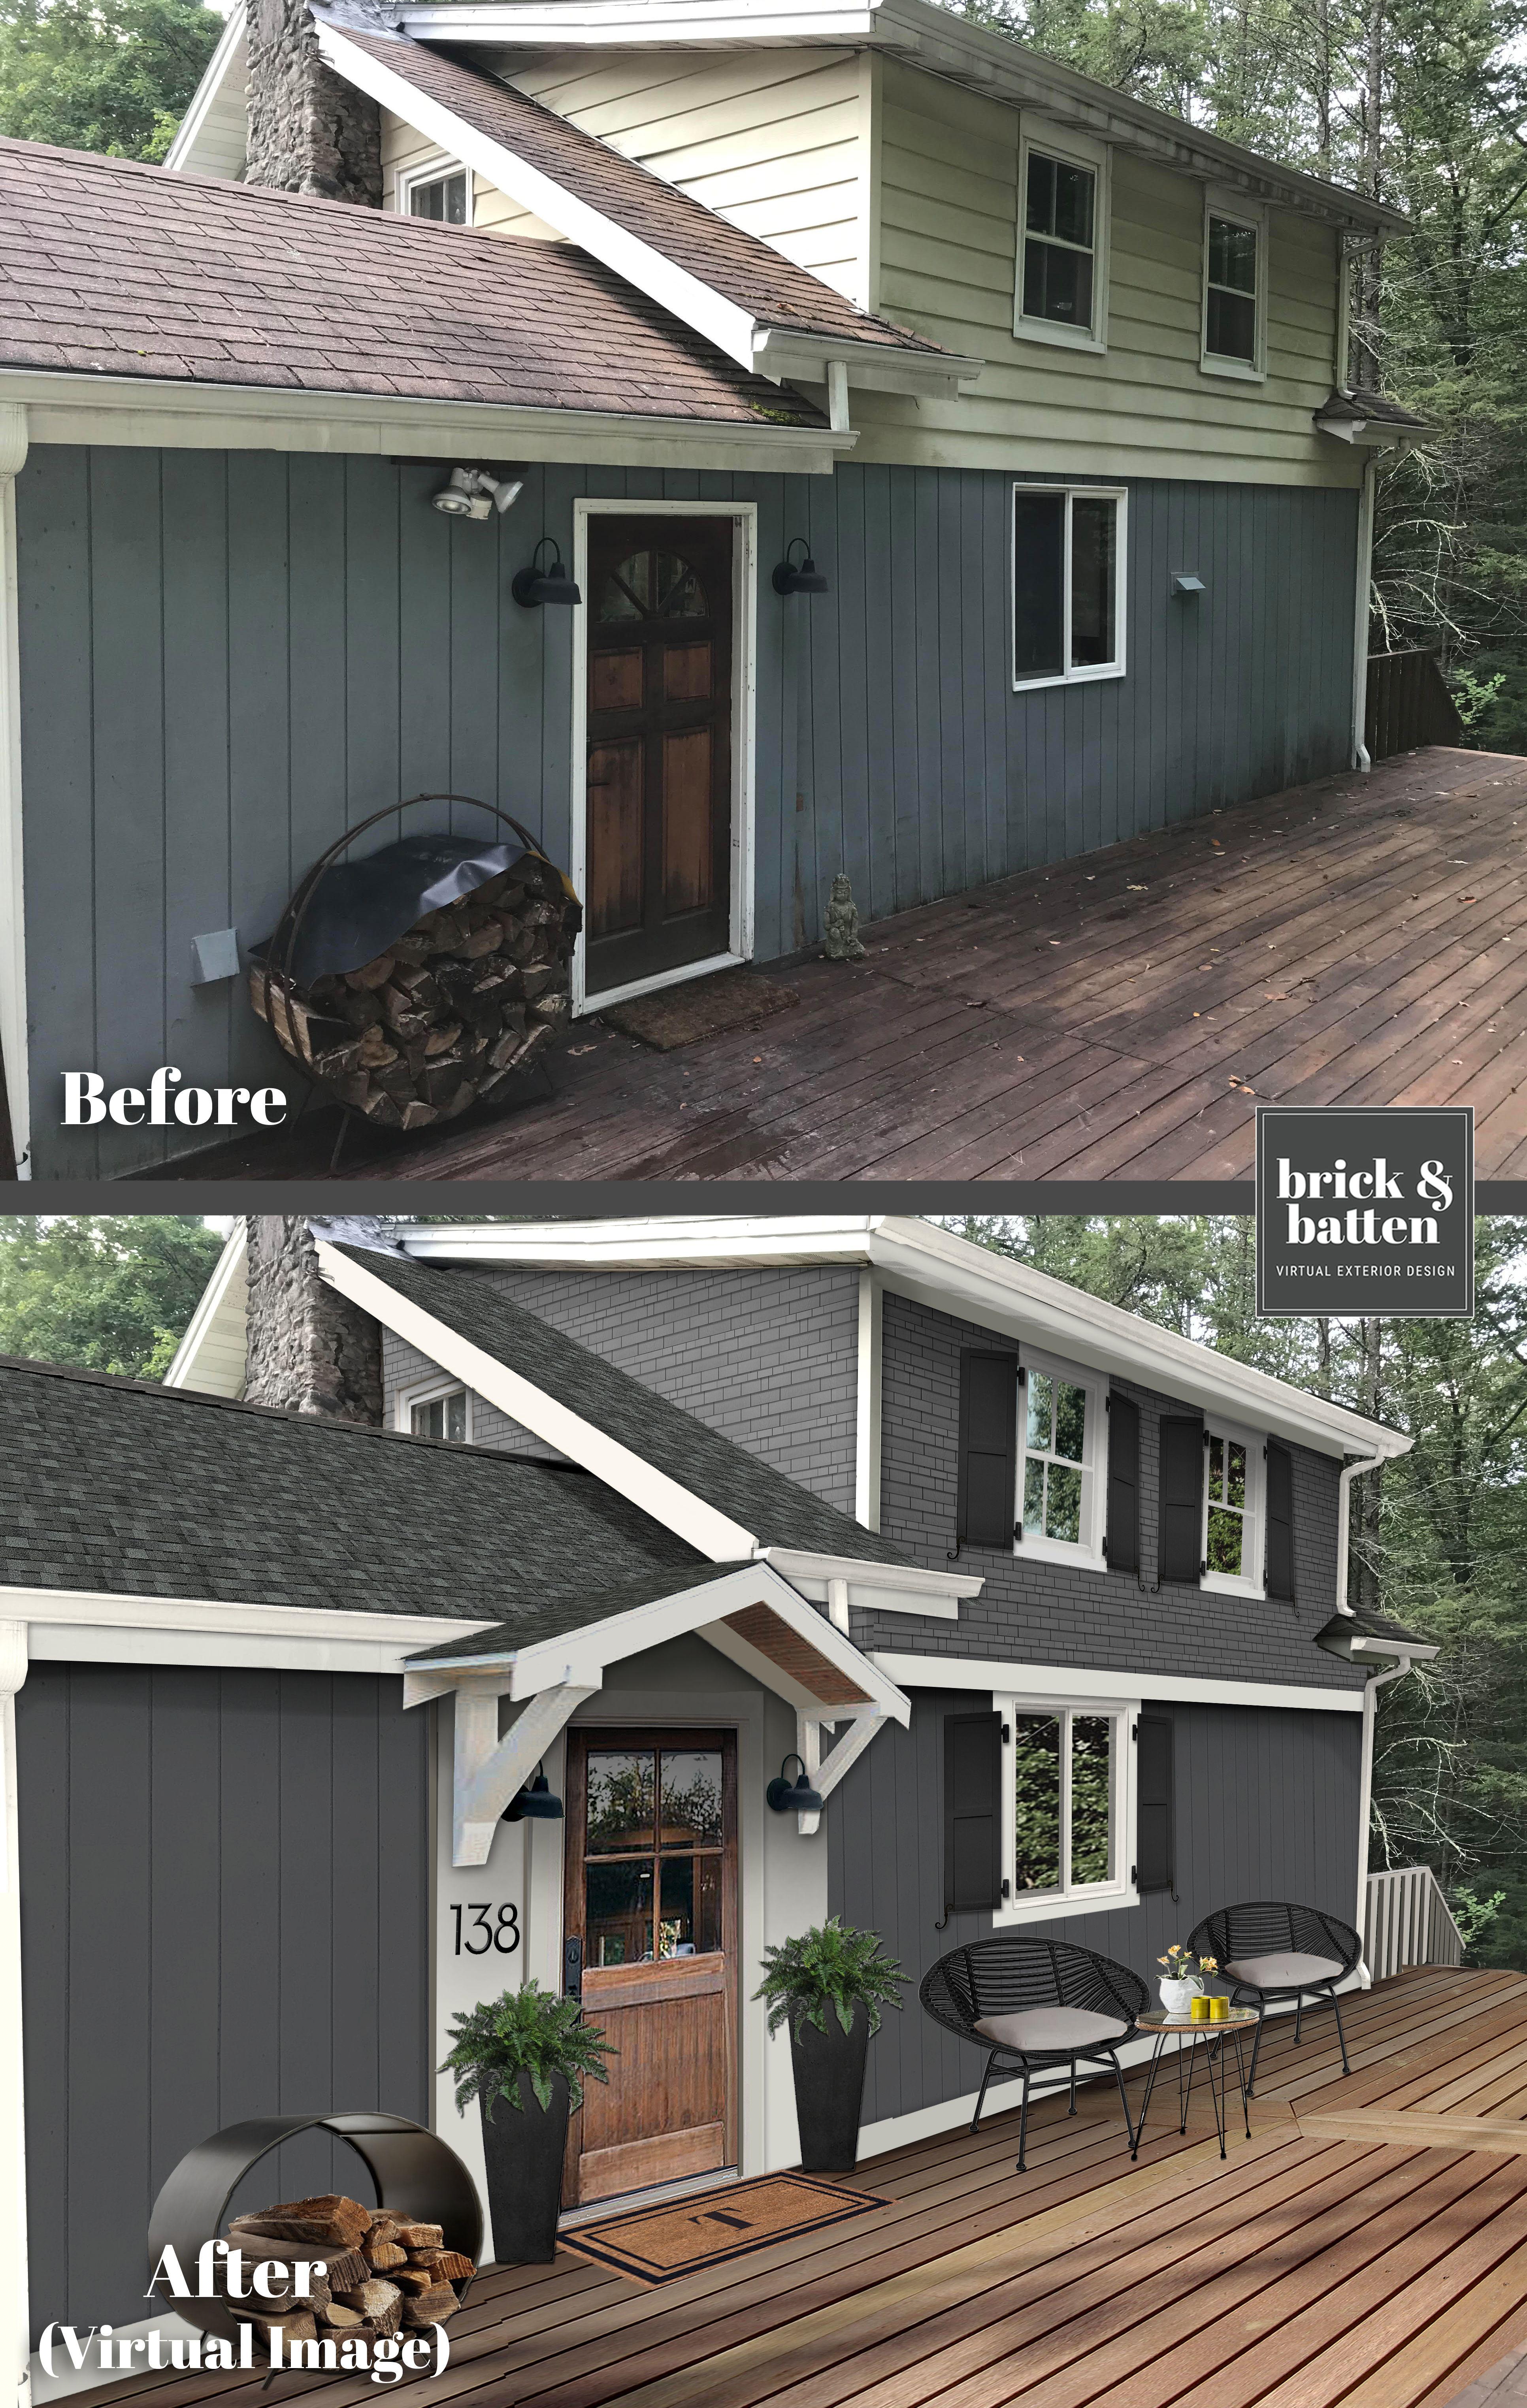 Best Front Door Ideas for Easy Curb Appeal Fix   Blog   brick&batten